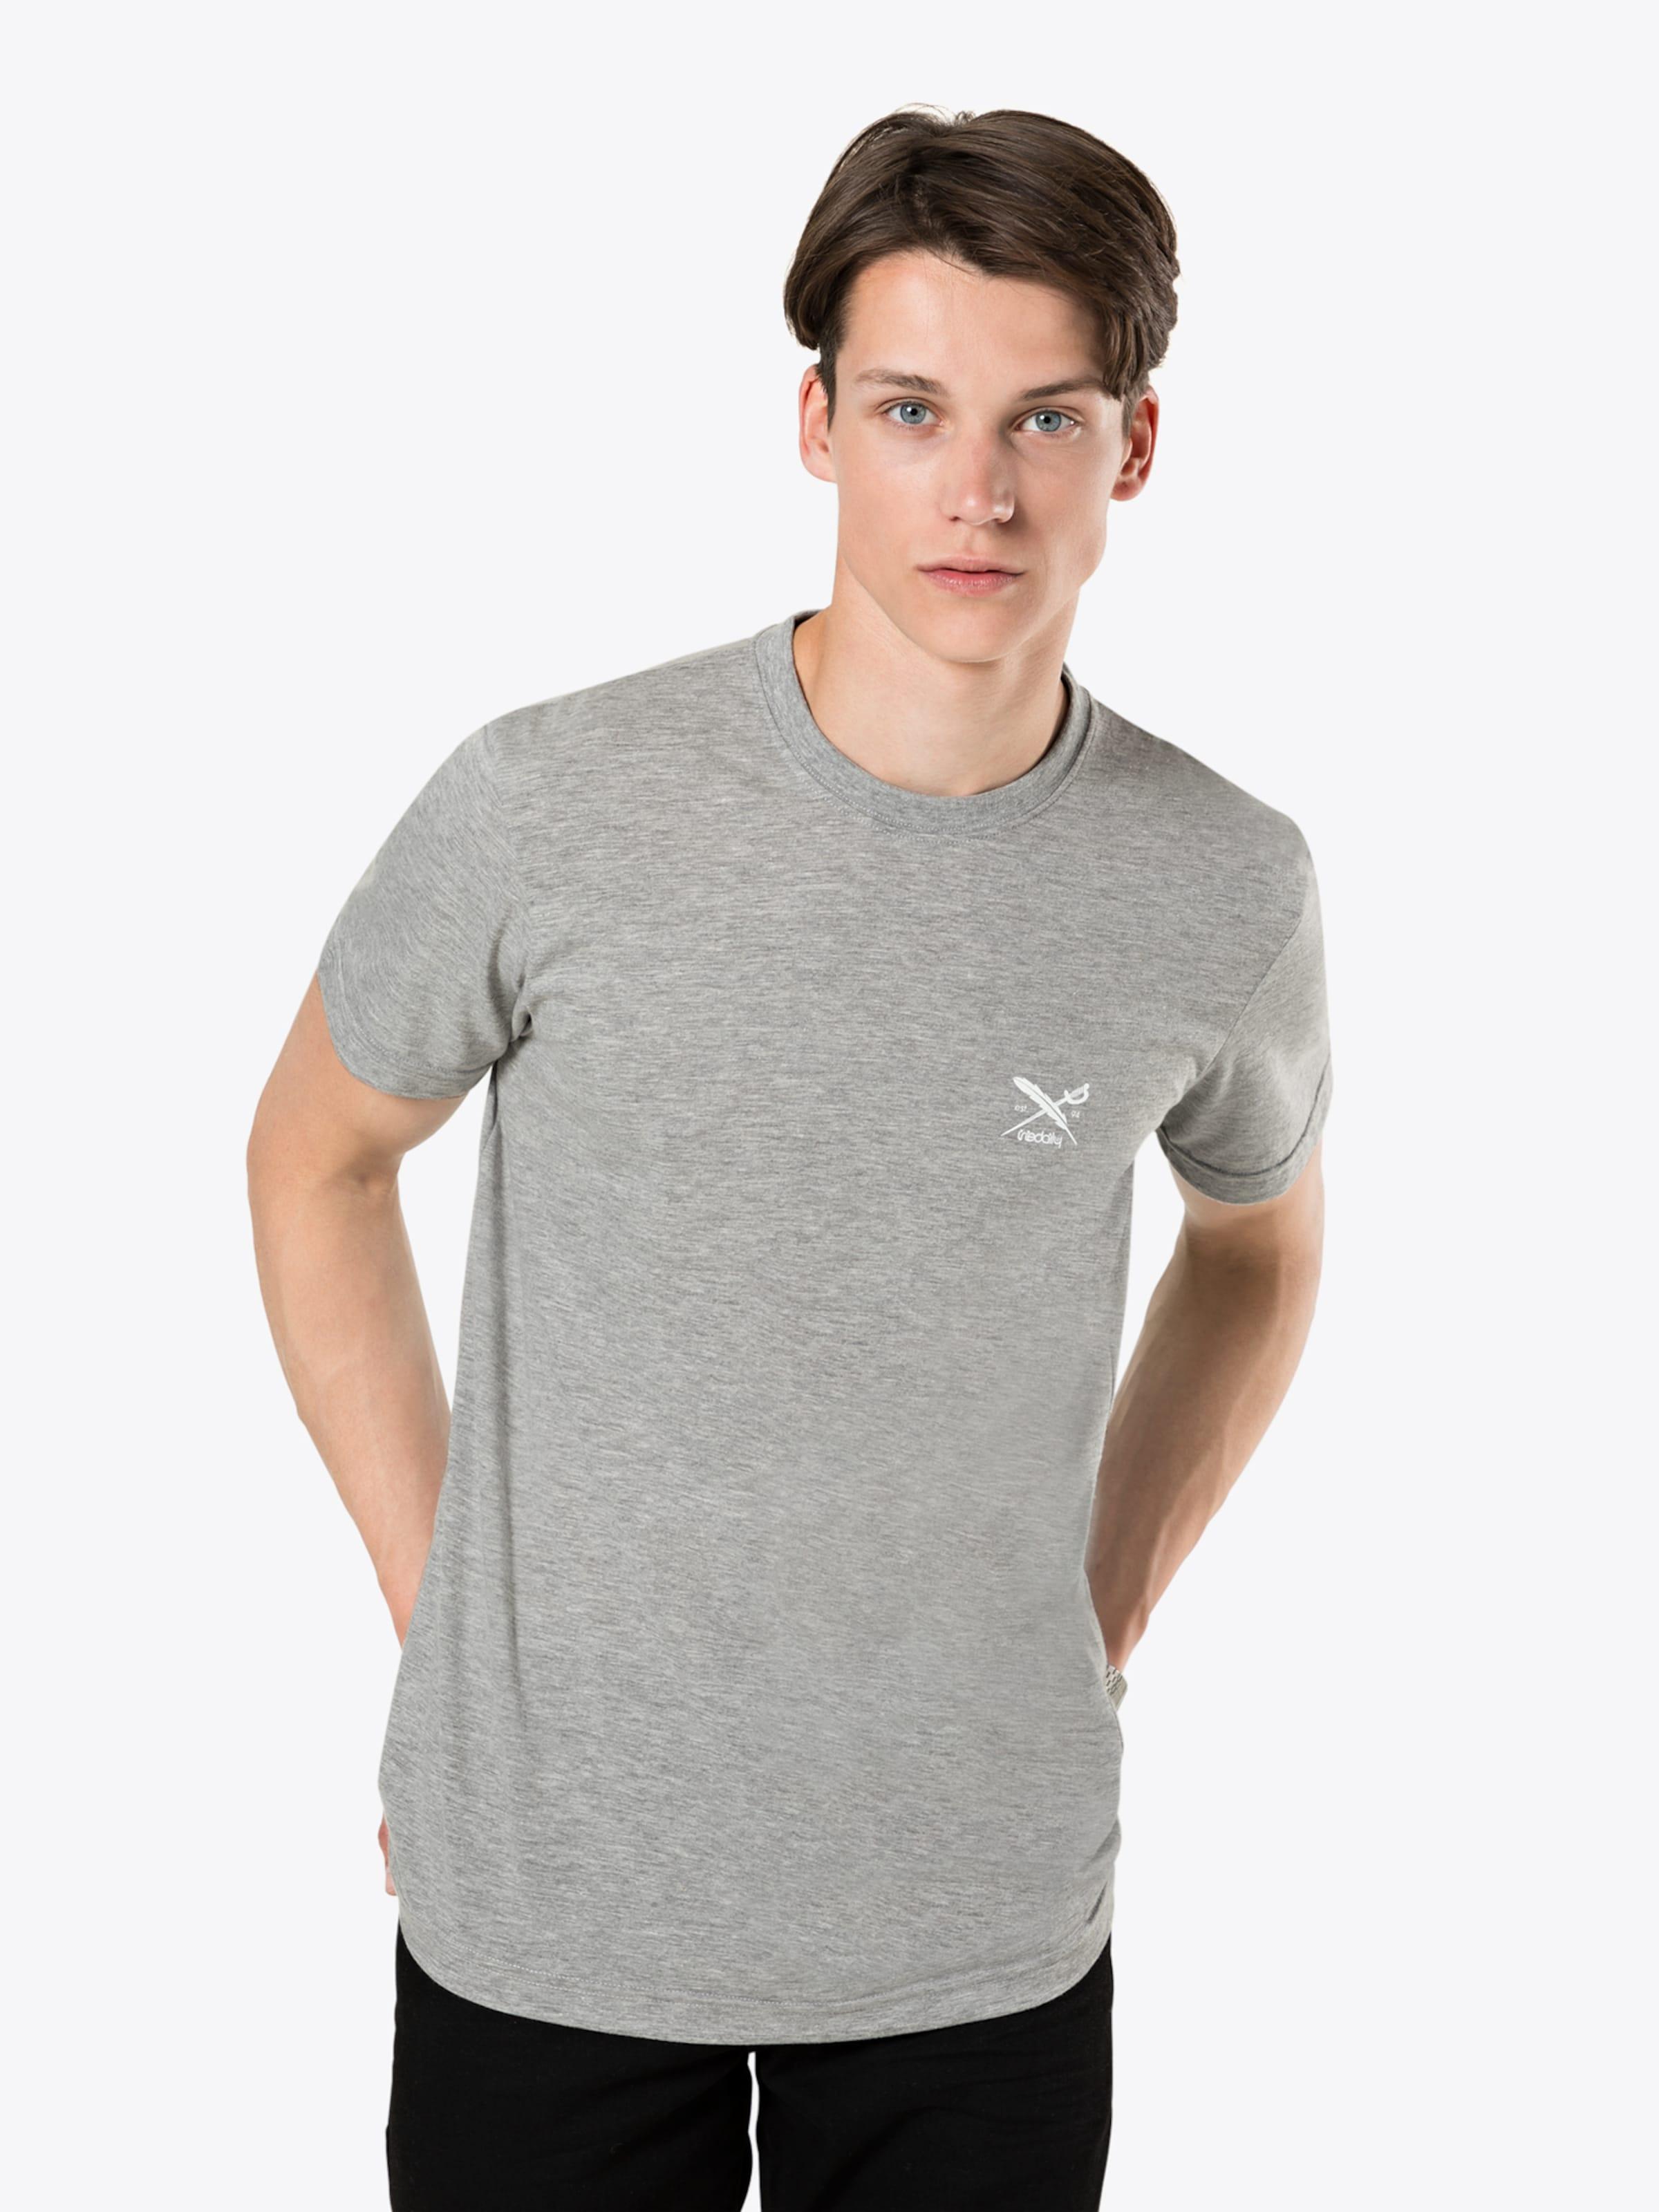 In T Iriedaily Graumeliert Tee' shirt 'chestflag mOyv8PNn0w